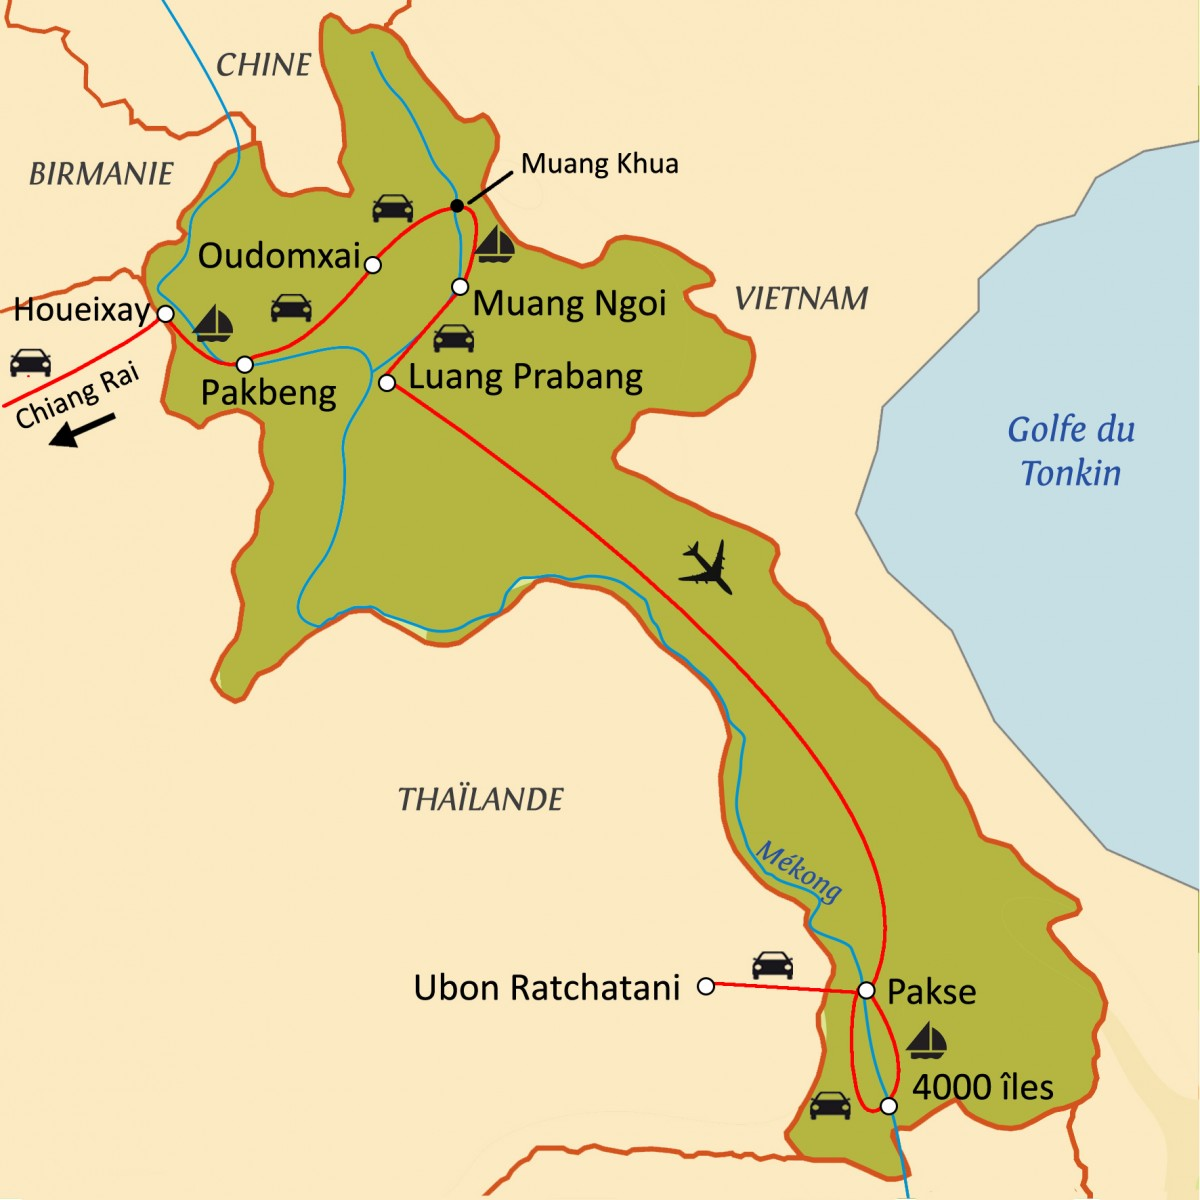 Laosvo : Trouver un pays plein d'attractions importantes